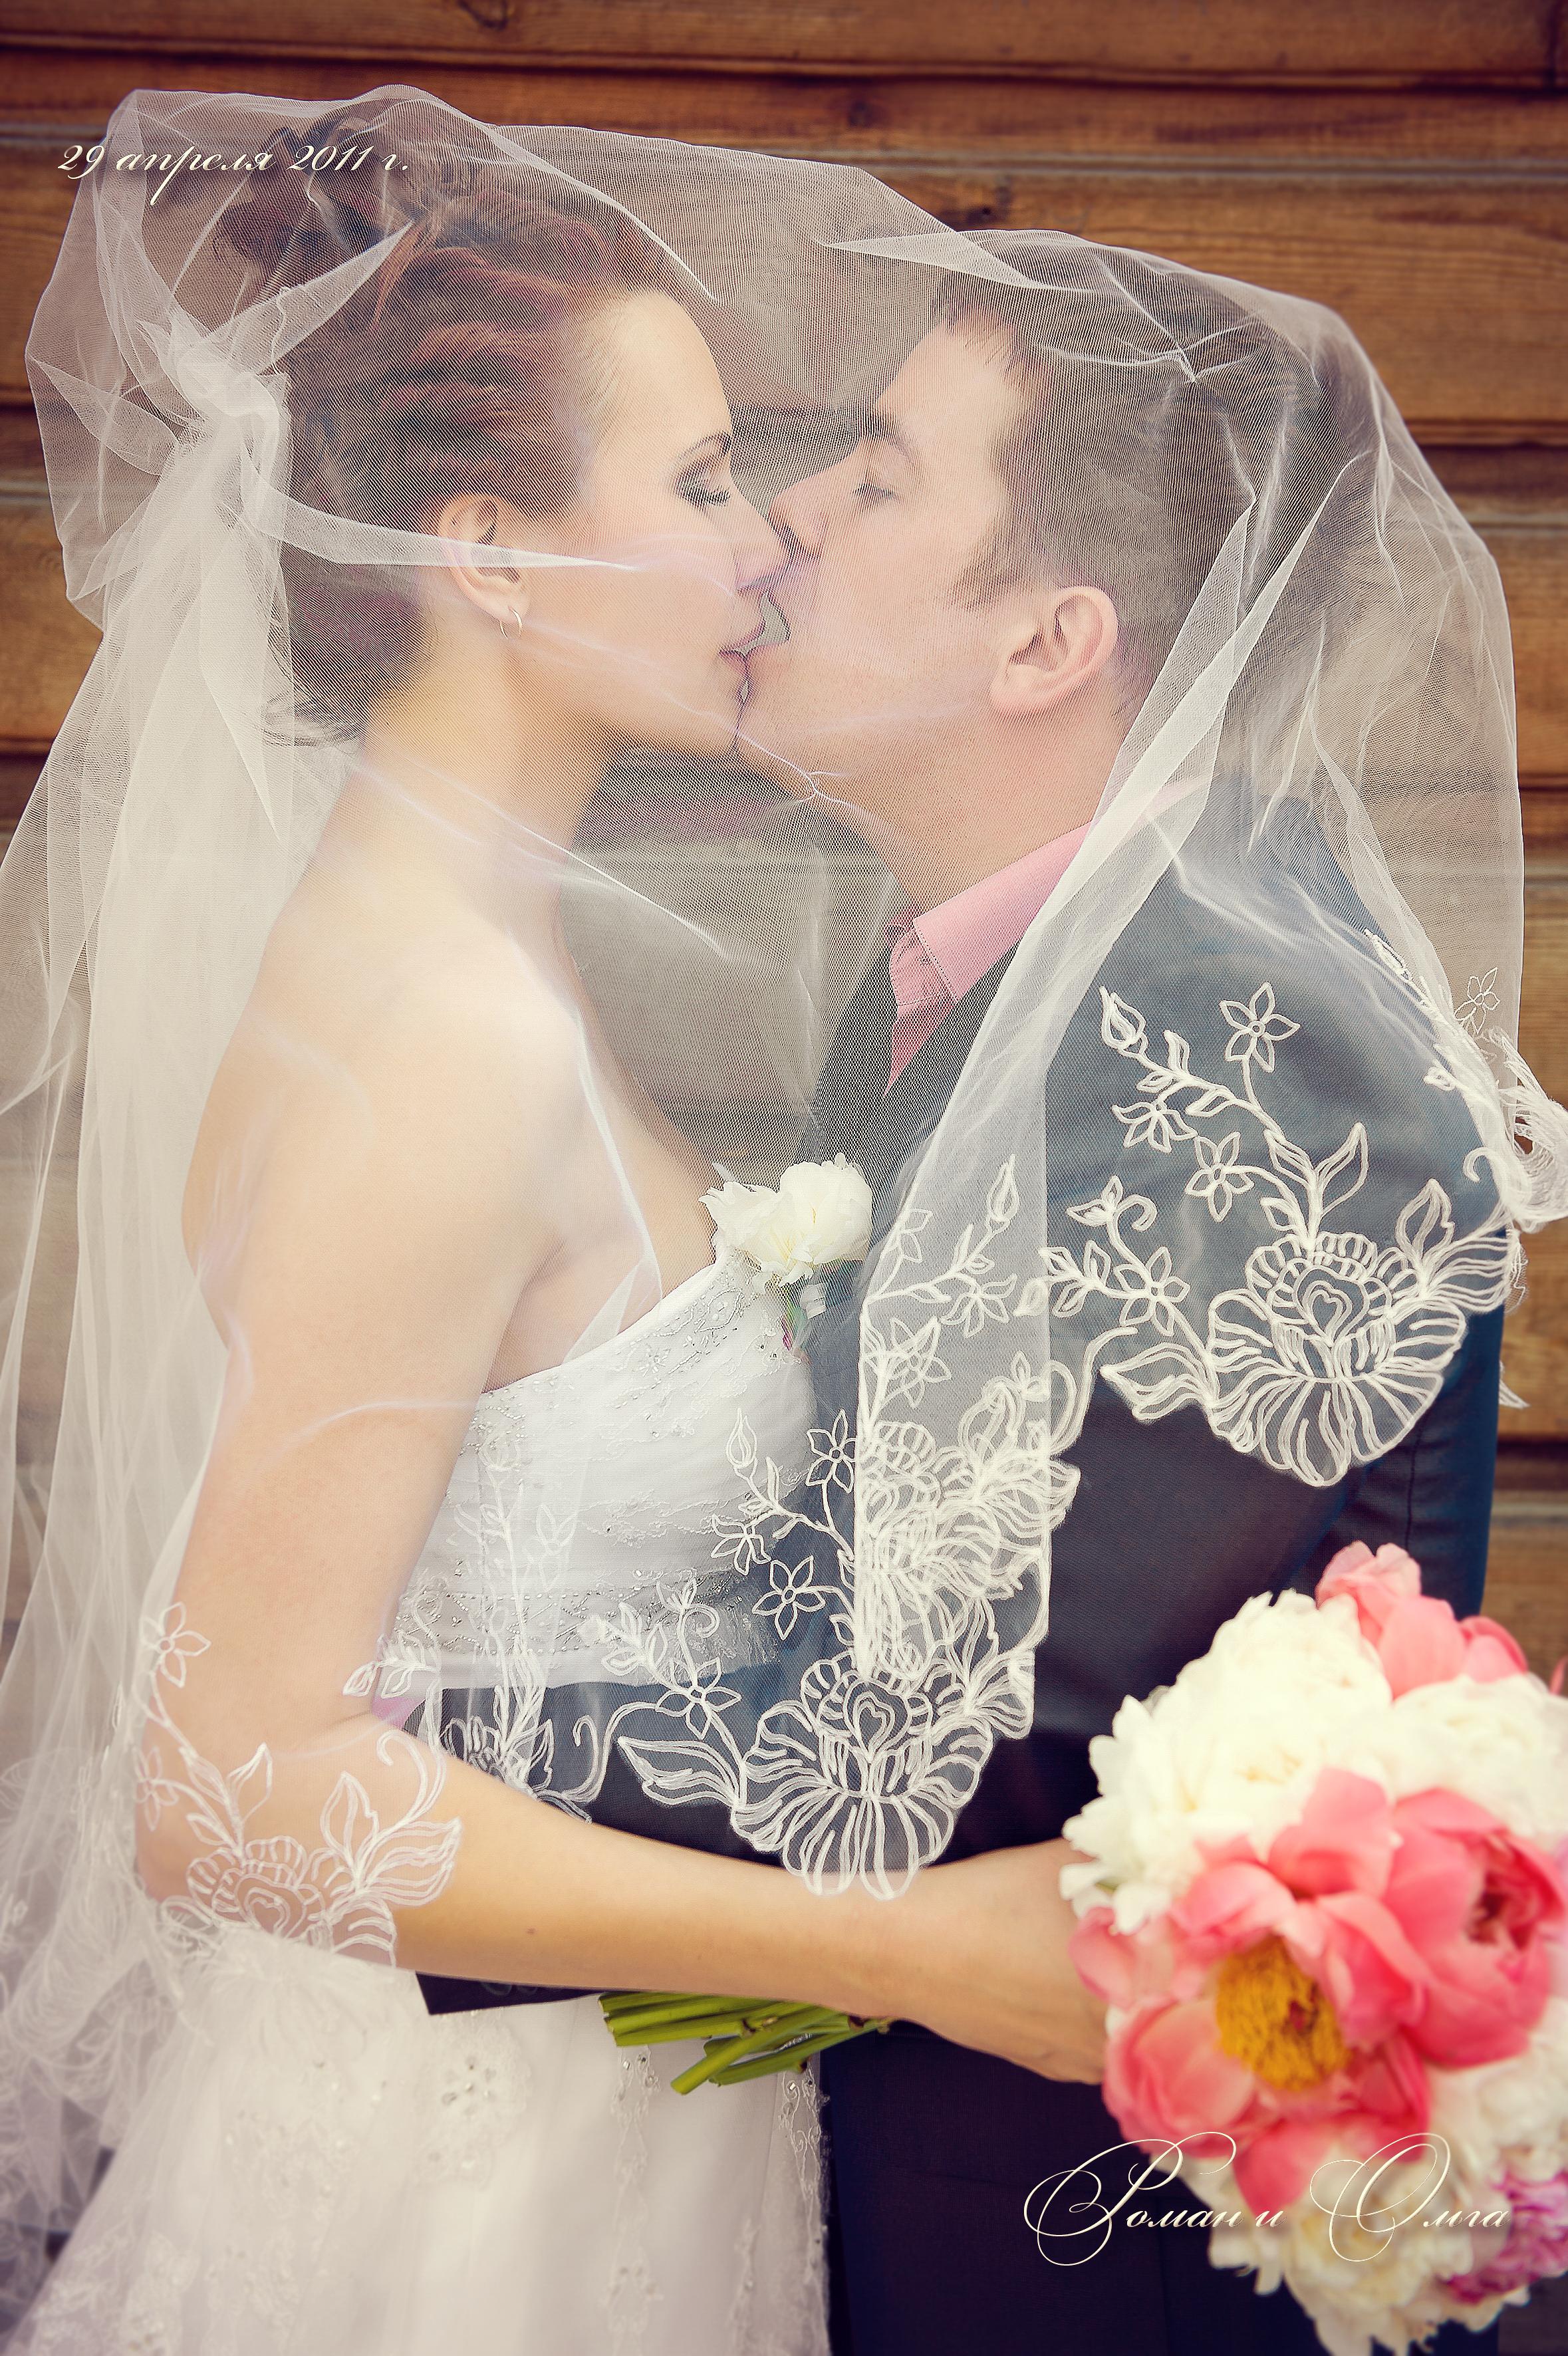 2011.04.29 - Роман и Ольга